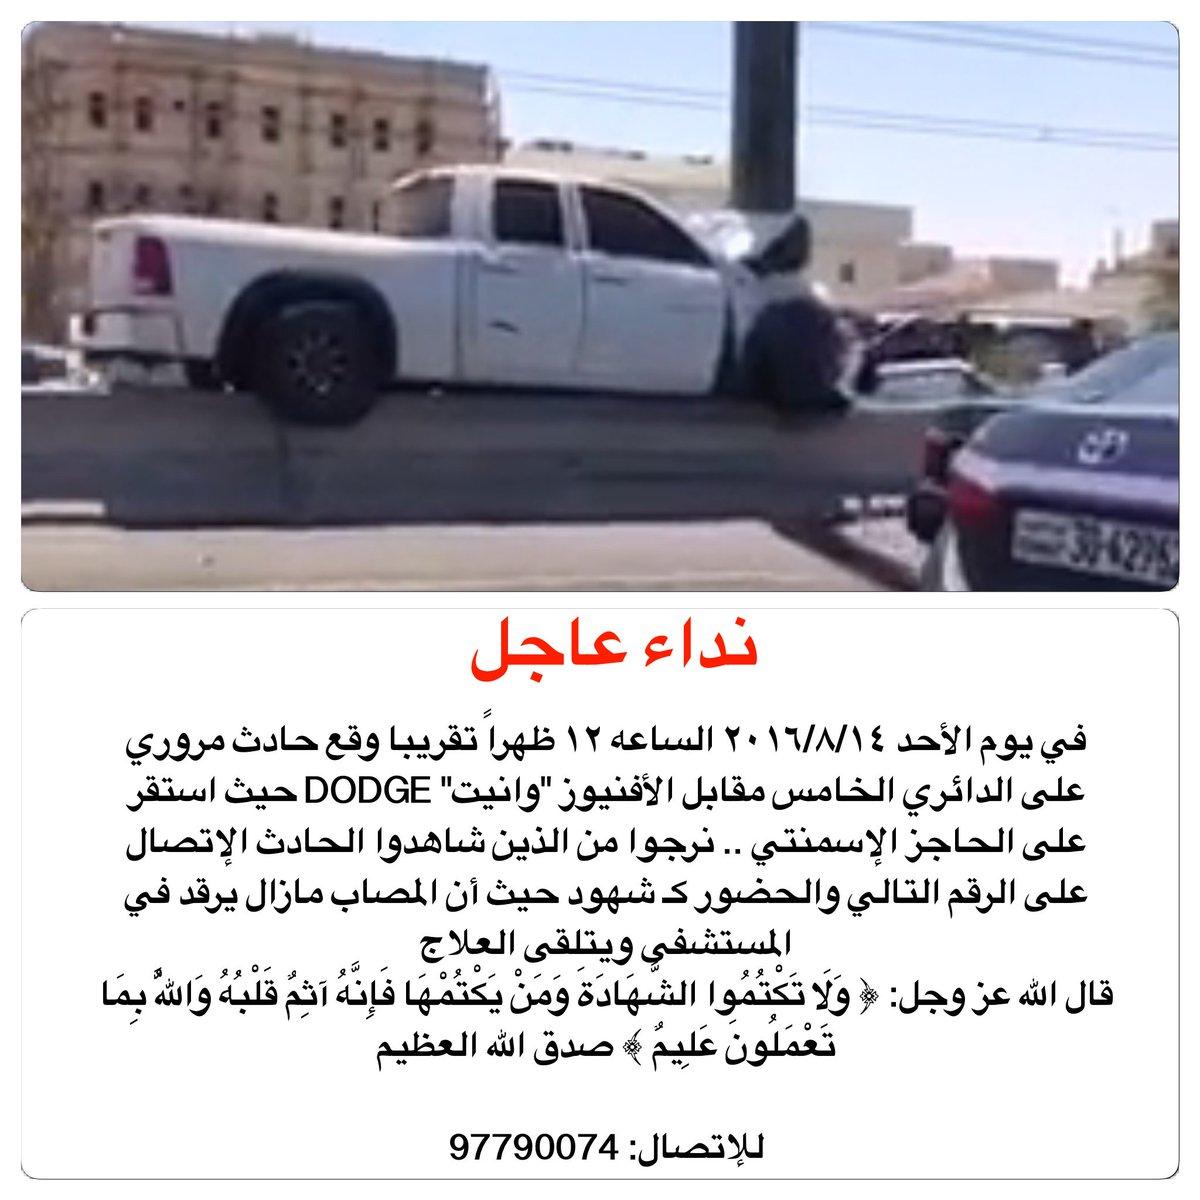 لمن شاهد الحادث .. https://t.co/YBiAfaDKxI